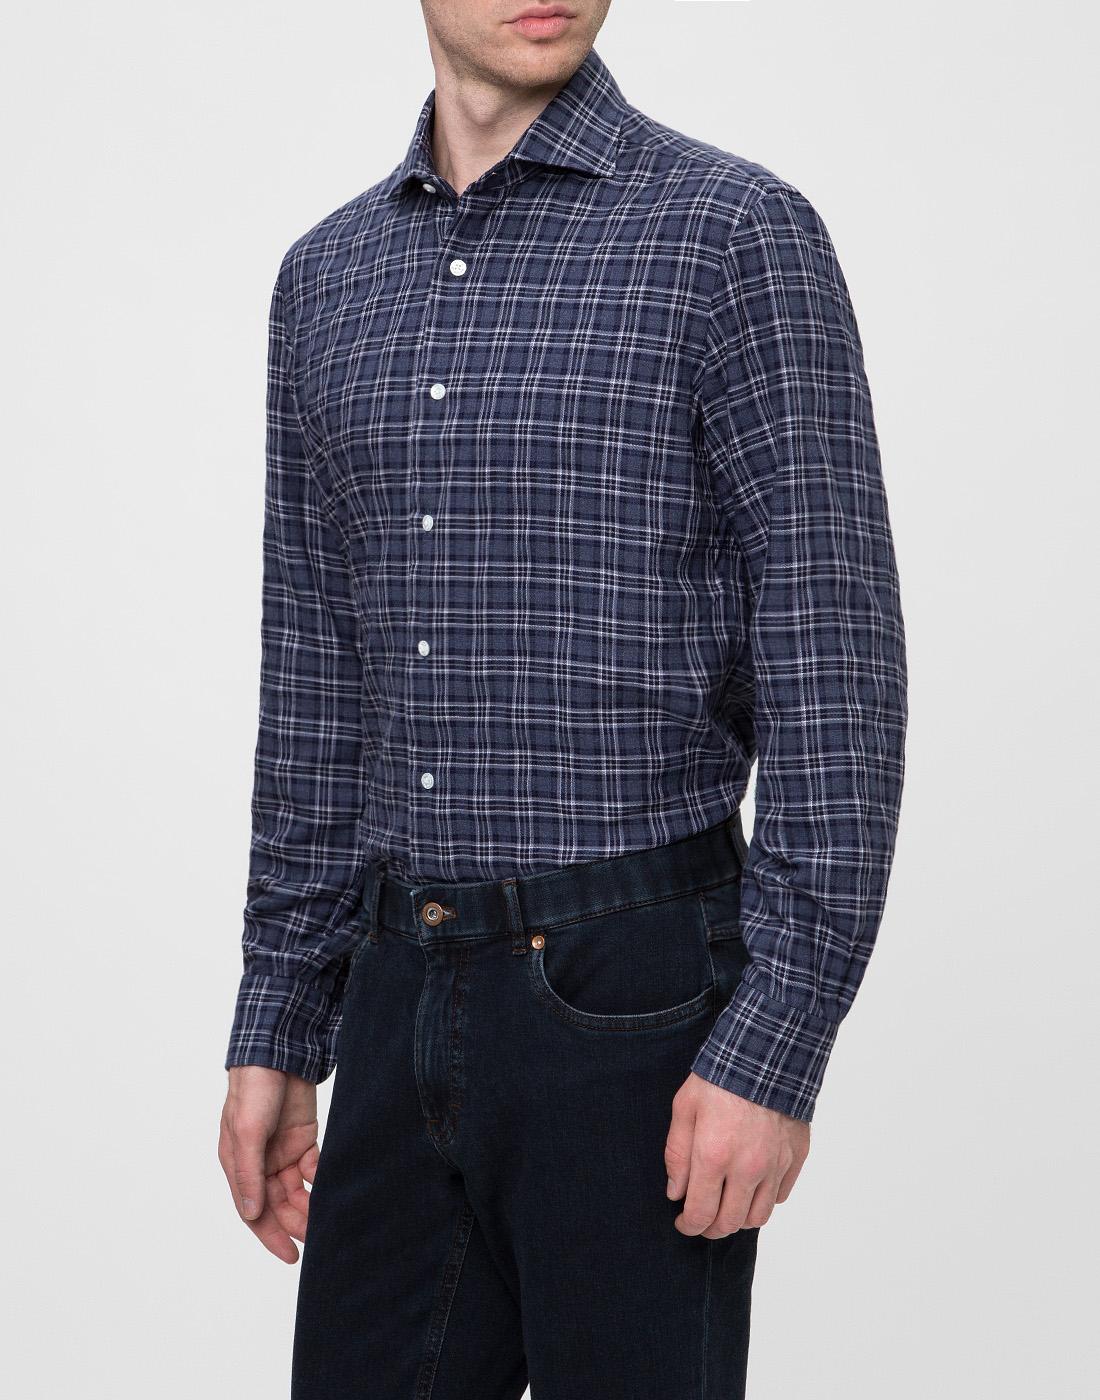 Мужская синяя рубашка в клетку Barba SD2U133603601X-3